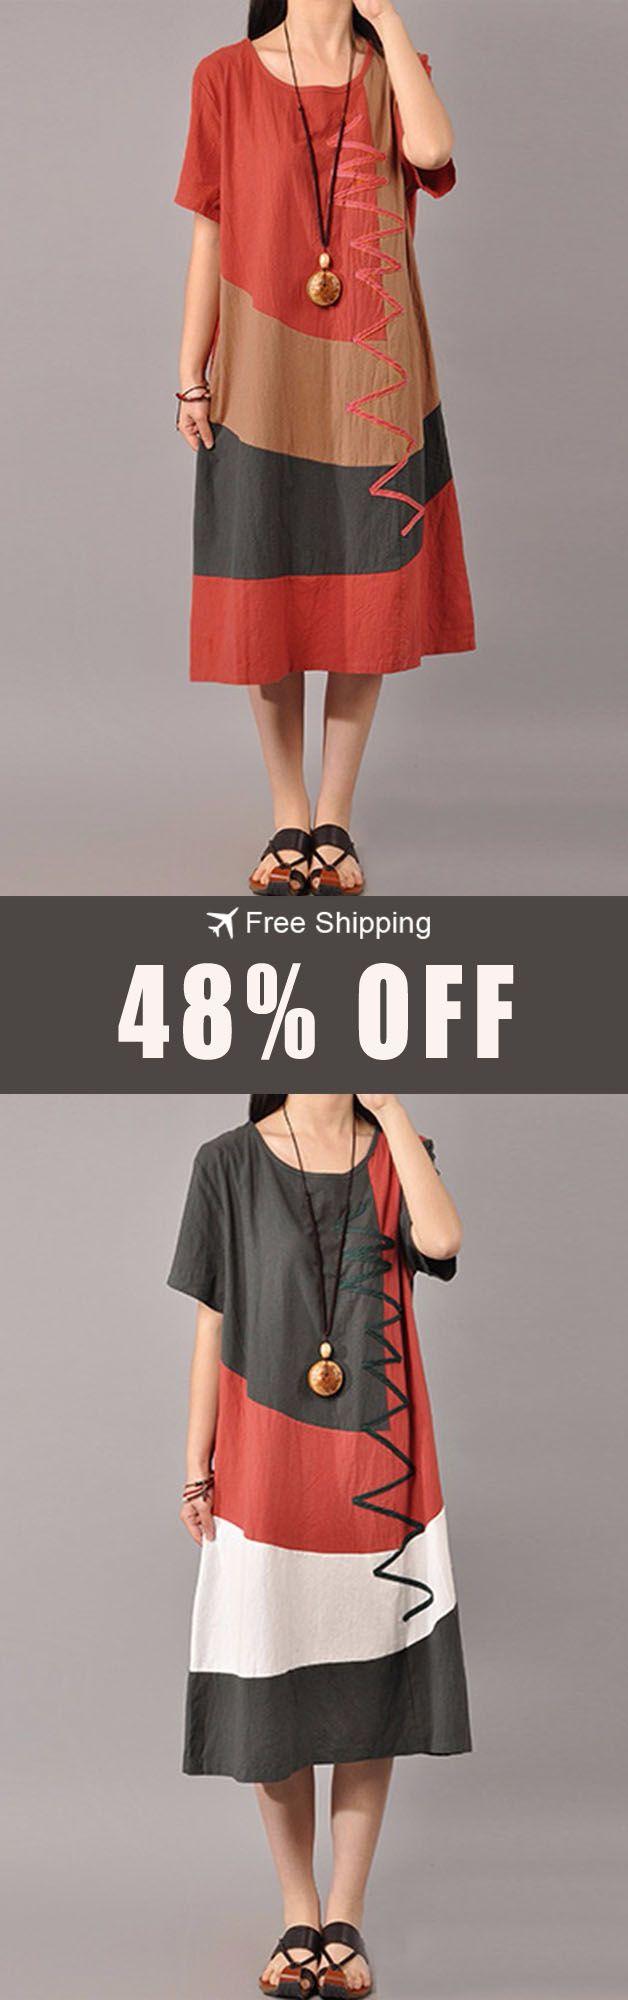 Offufree shipping sxl women casual short sleeve splice loose o